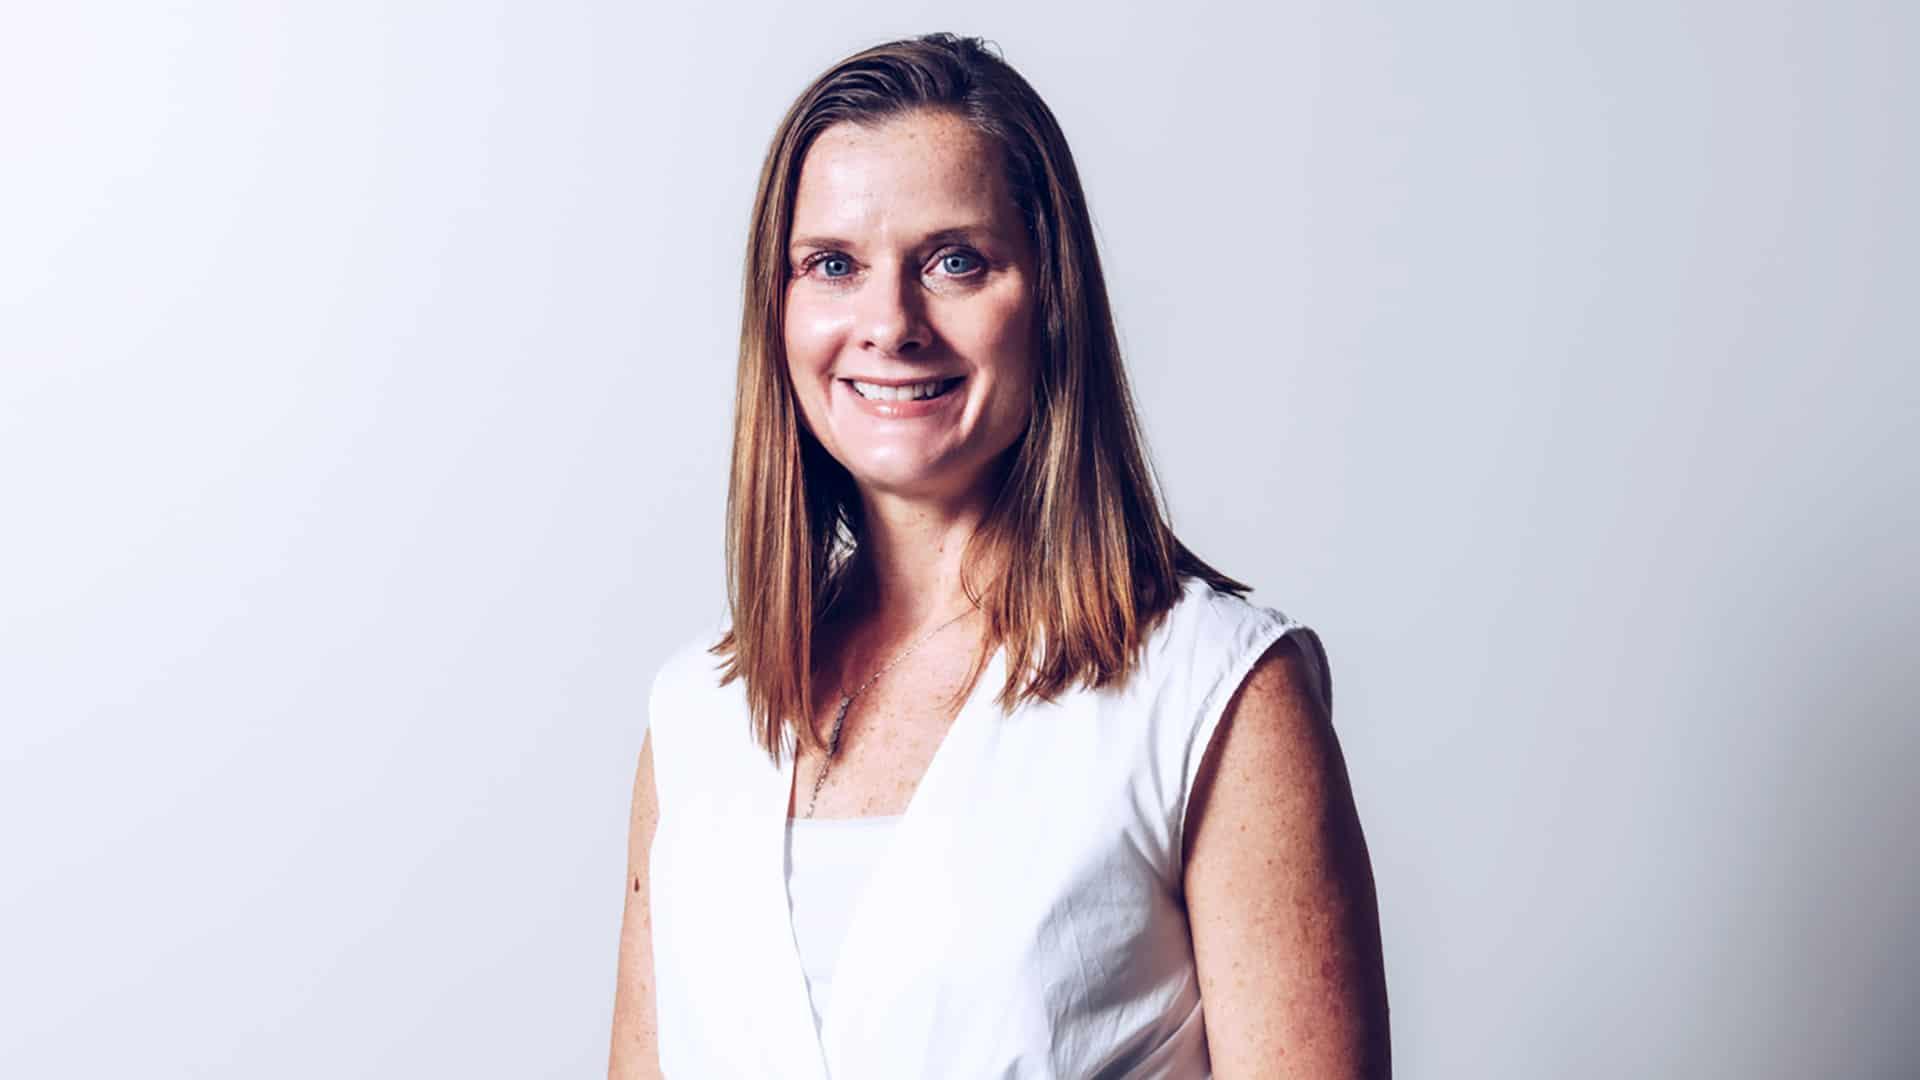 Beth Johnson